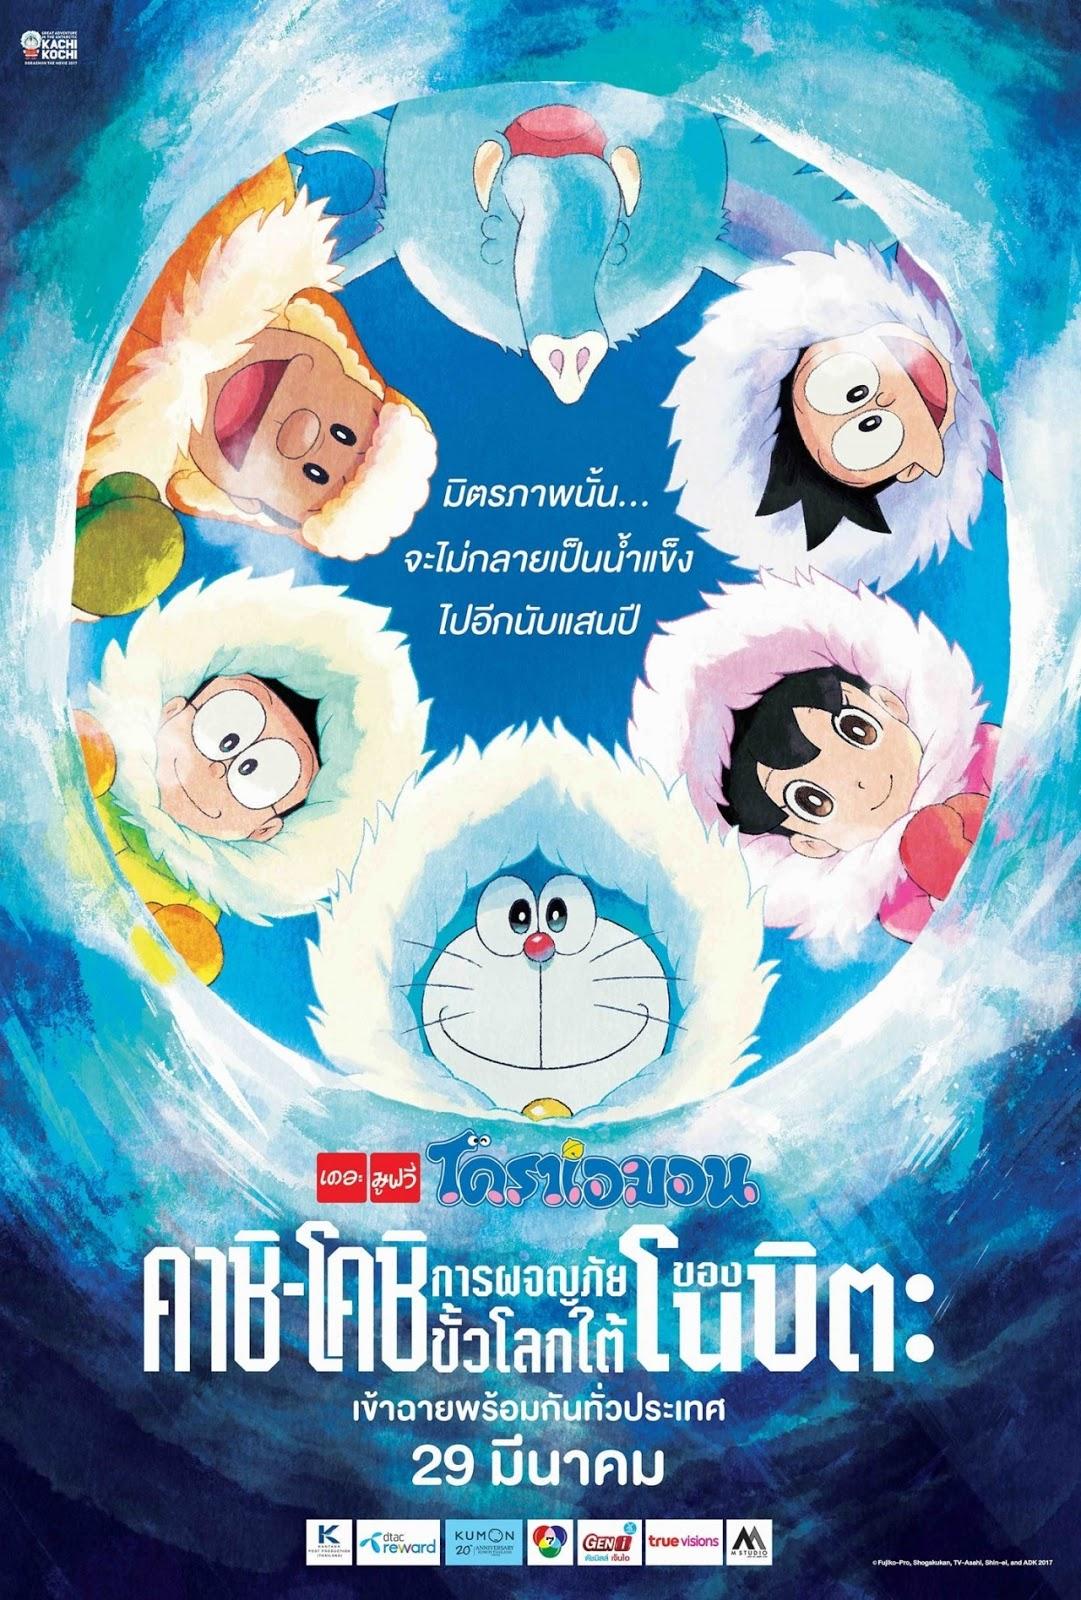 Doraemon: Great Adventure in the Antarctic Kachi Kochi (2017) โดราเอมอน ตอน คาชิ-โคชิ การผจญภัยขั้วโลกใต้ของโนบิตะ